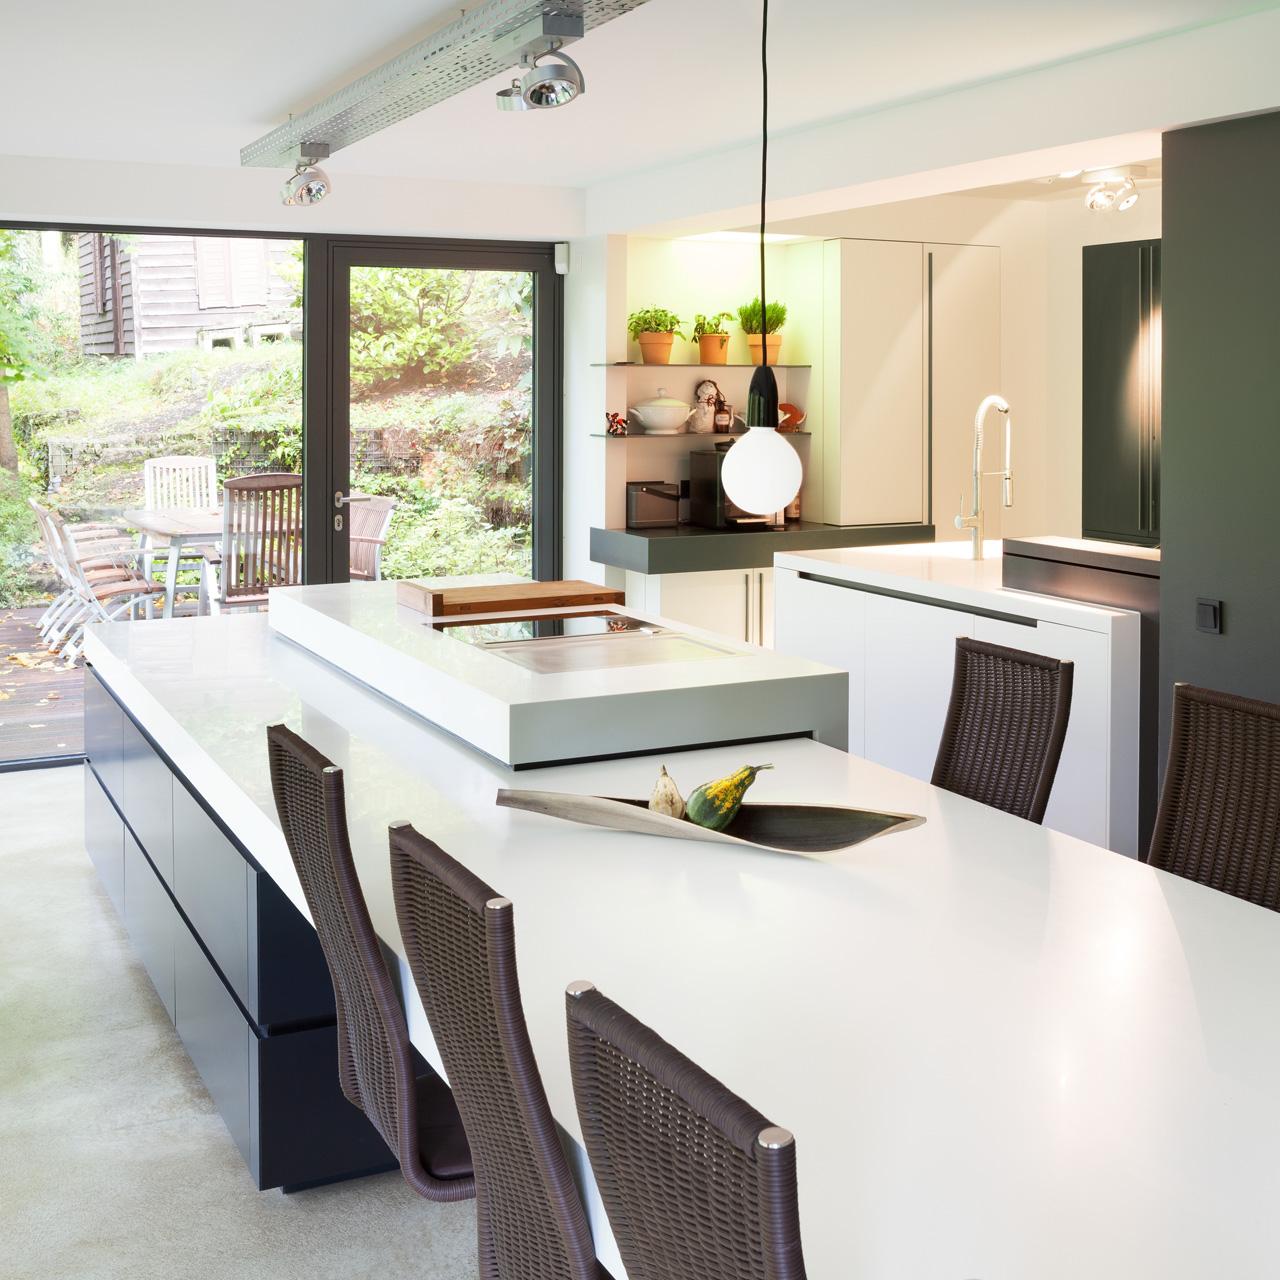 plan 3 kitchens / V4 / Living in nature